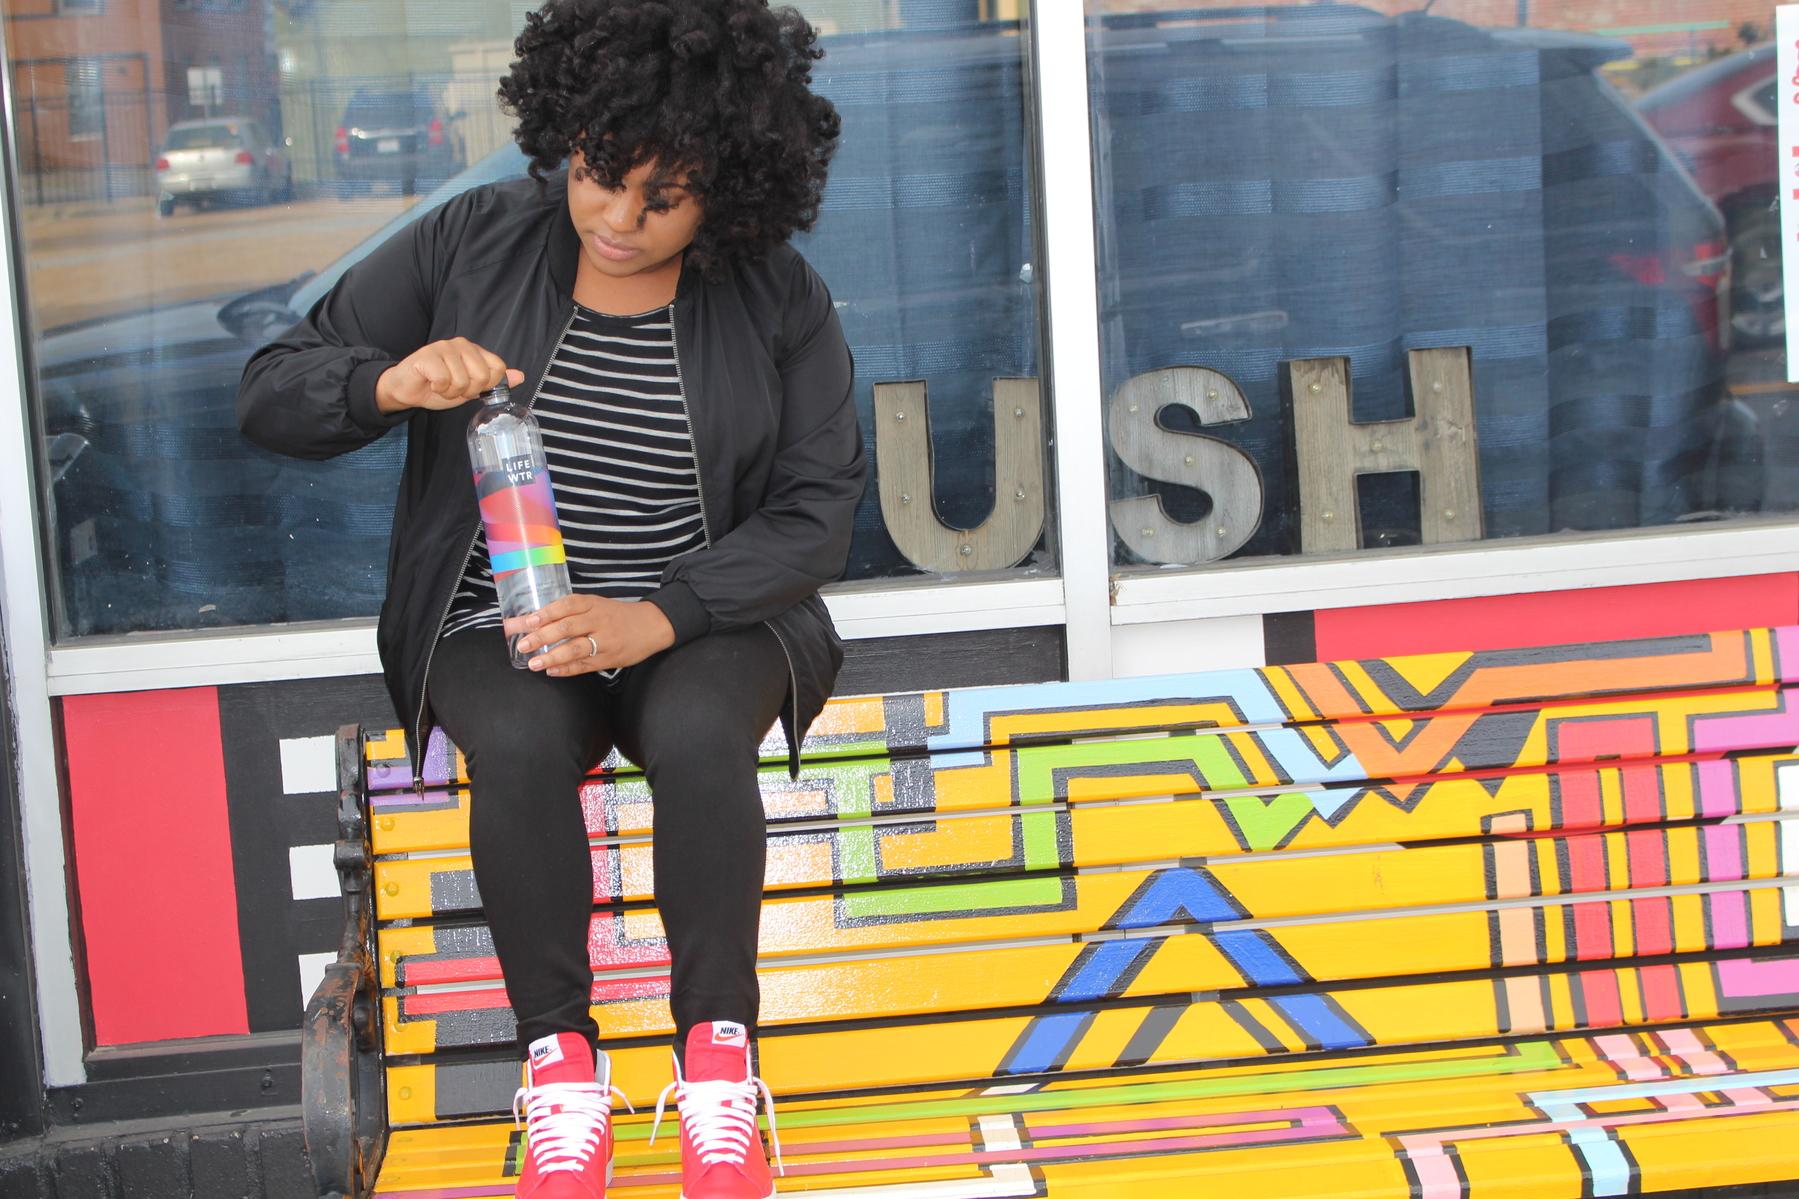 sitting on bench holding LIFEWTR